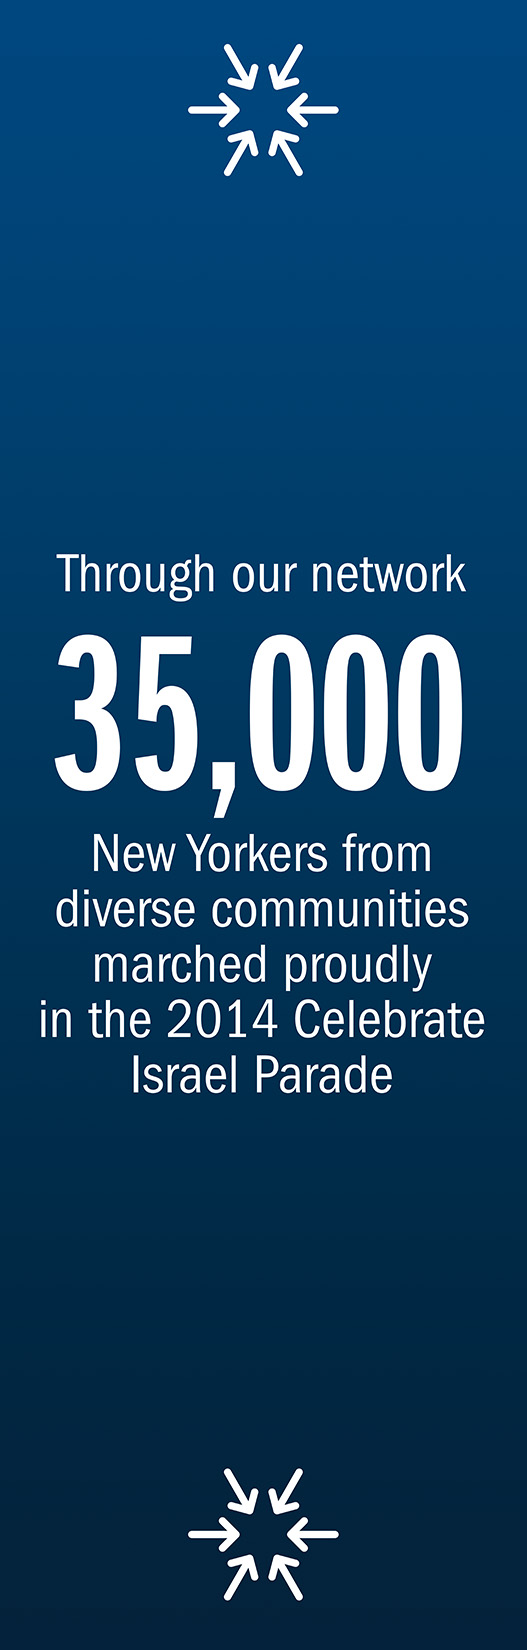 UJA Jewish Diversity Banner rev06 Side B.jpg